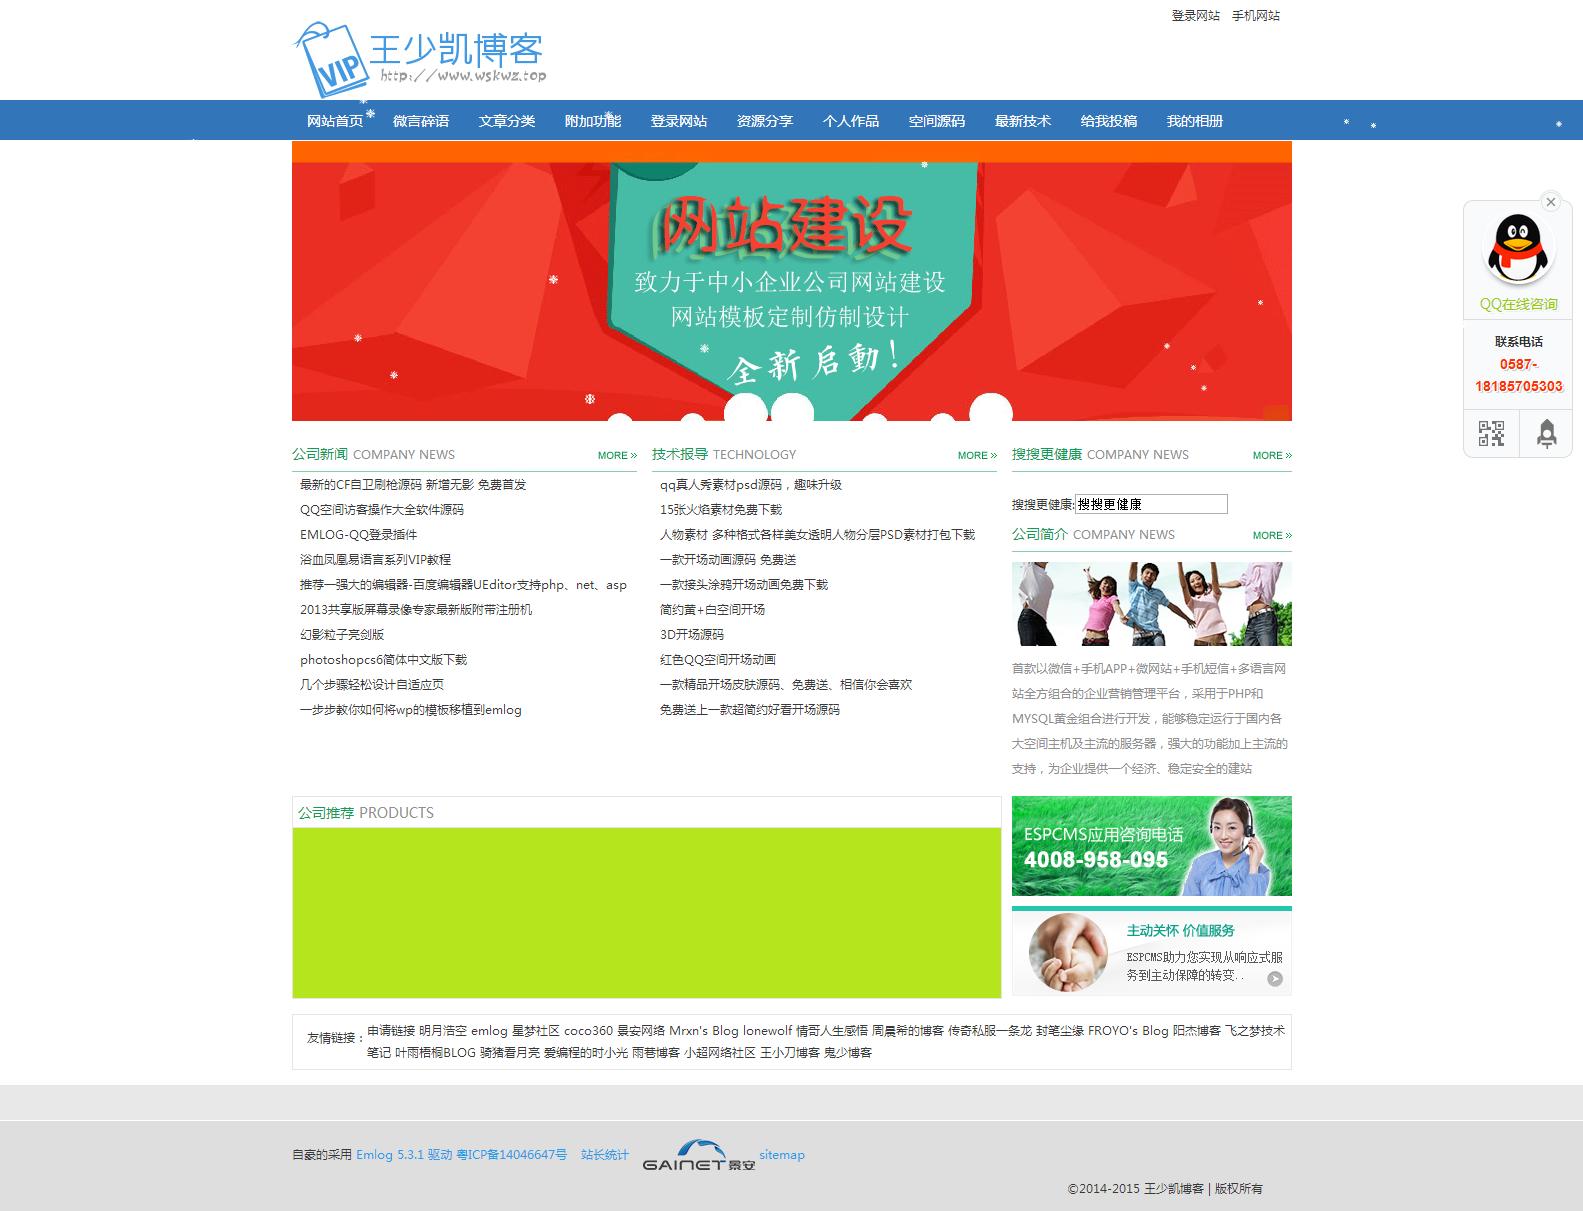 蓝色emlog企业模板wskmkcms